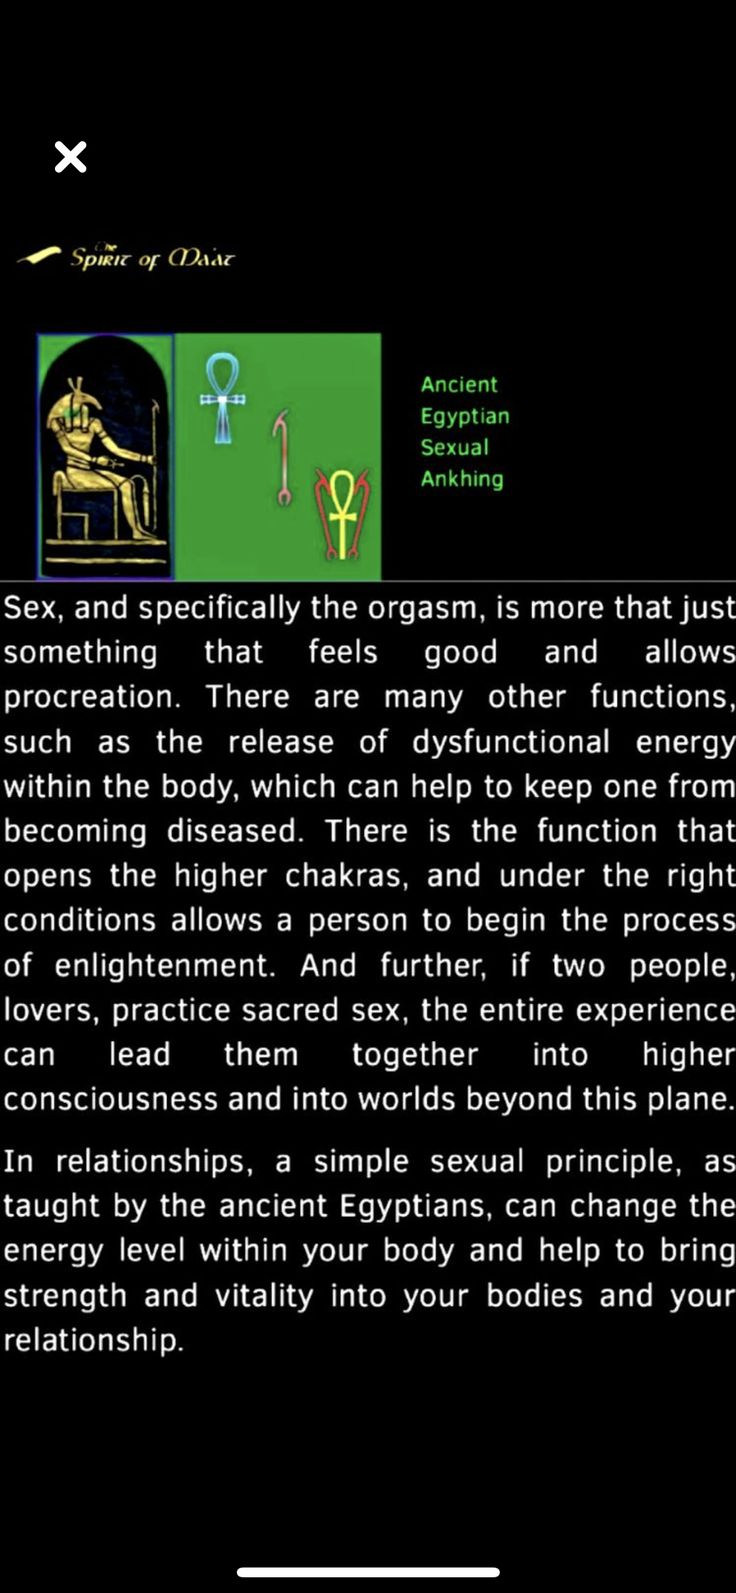 Pin by 𝐋𝐚𝐮𝐫𝐞𝐧 on Screenshots Spiritual crystals